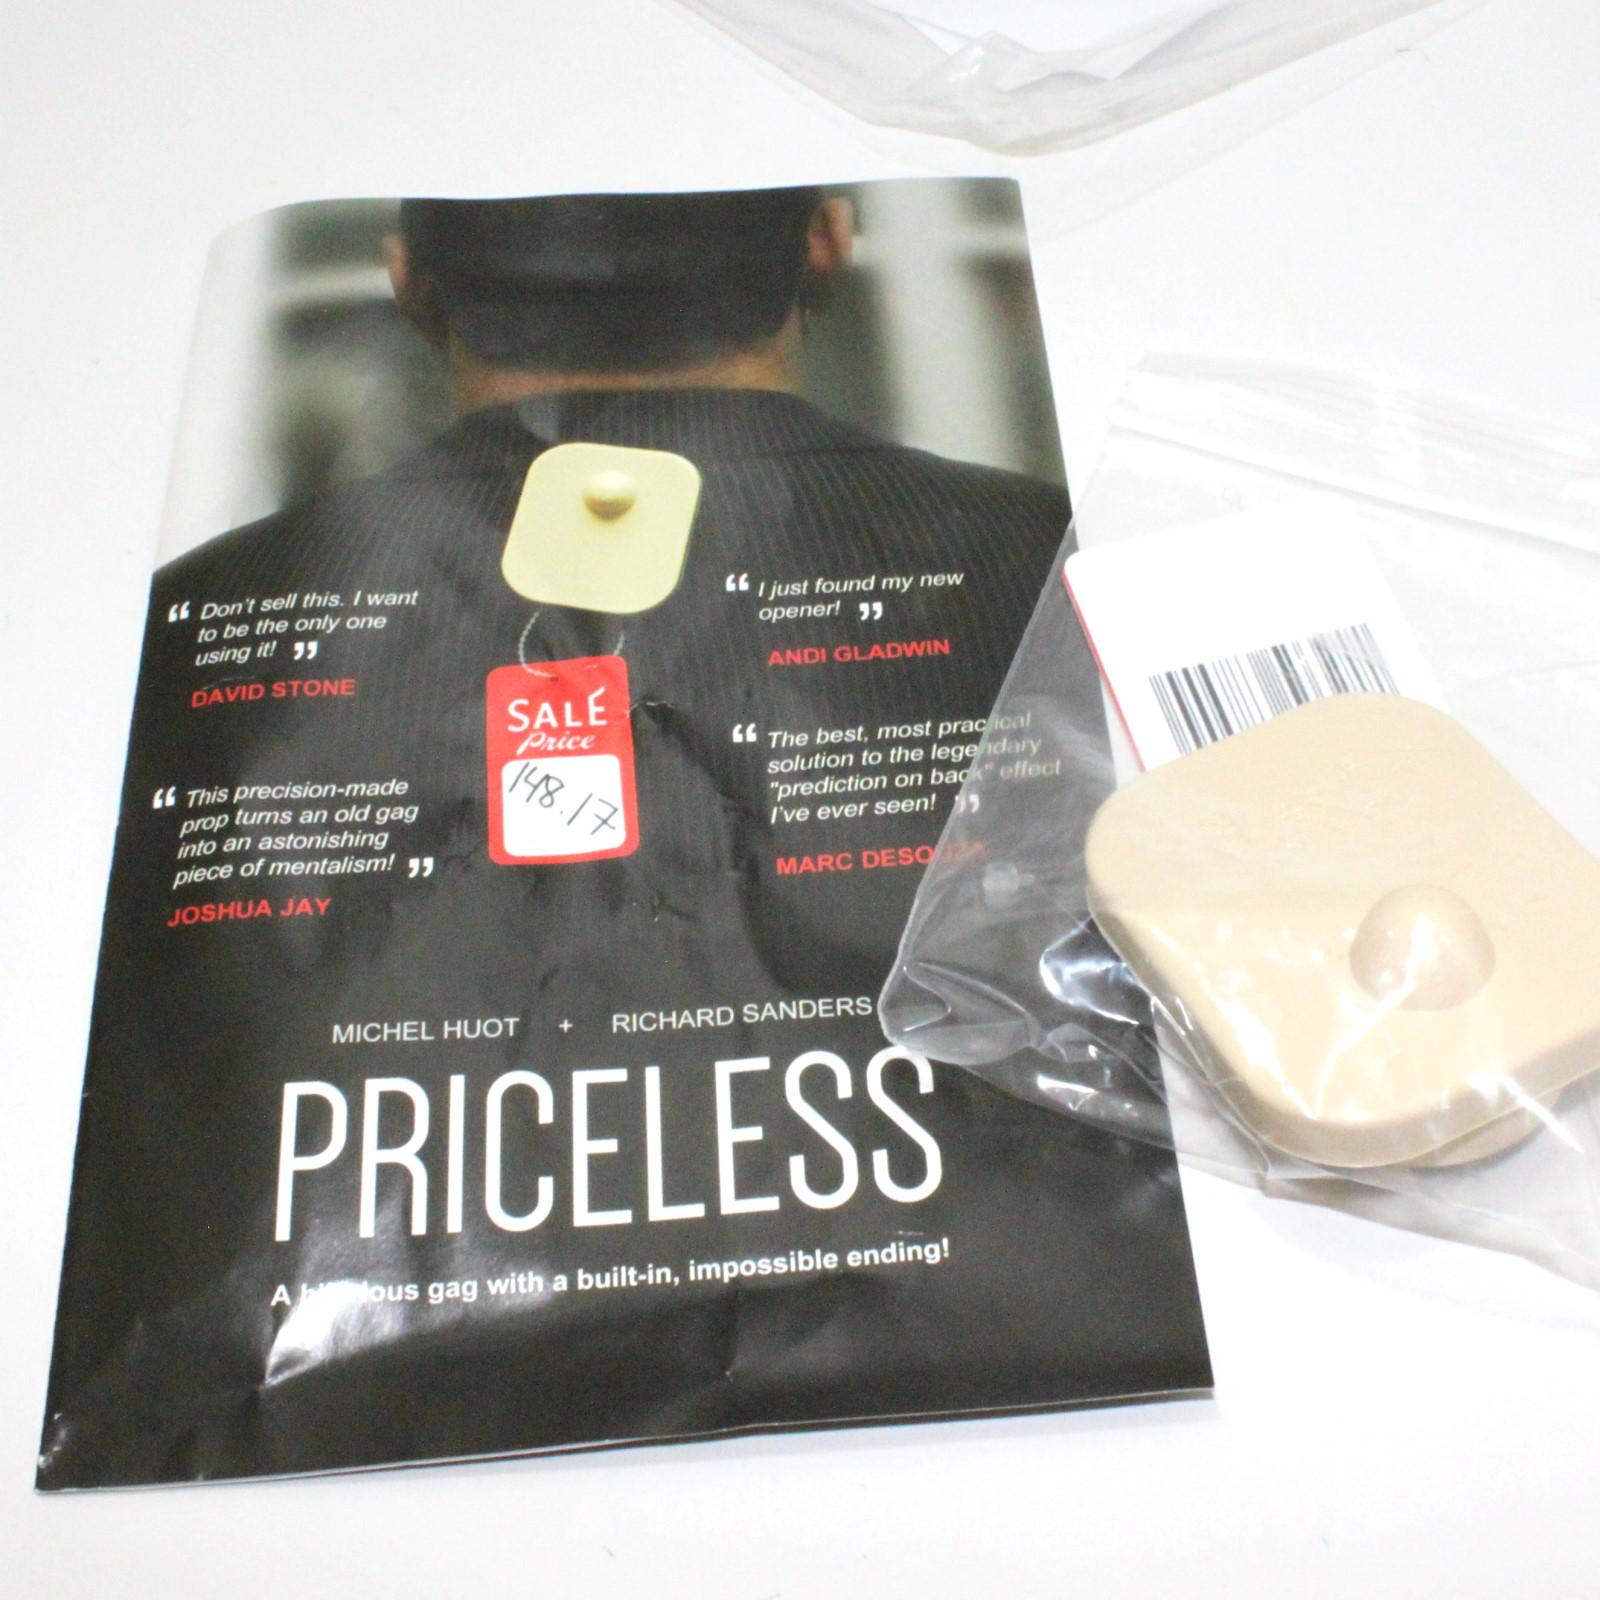 Priceless by Richard Sanders